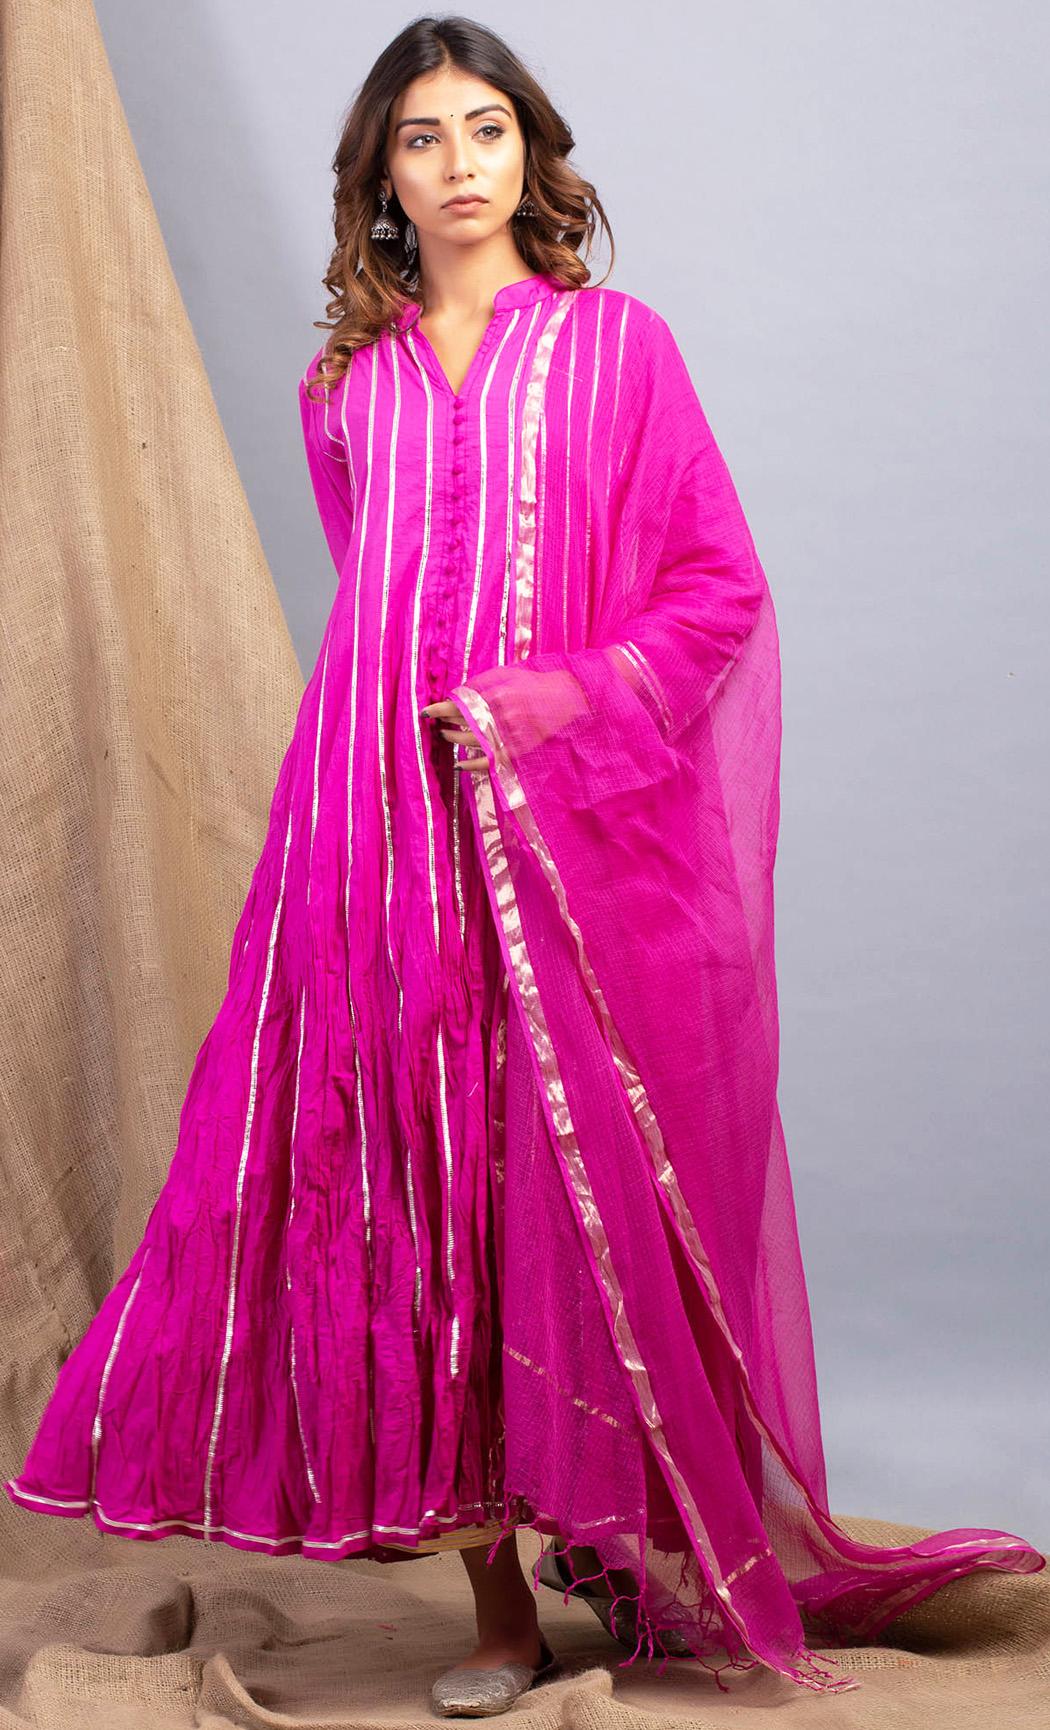 Aubergine Pink Kurta and Dupatta Set. Buy Online.